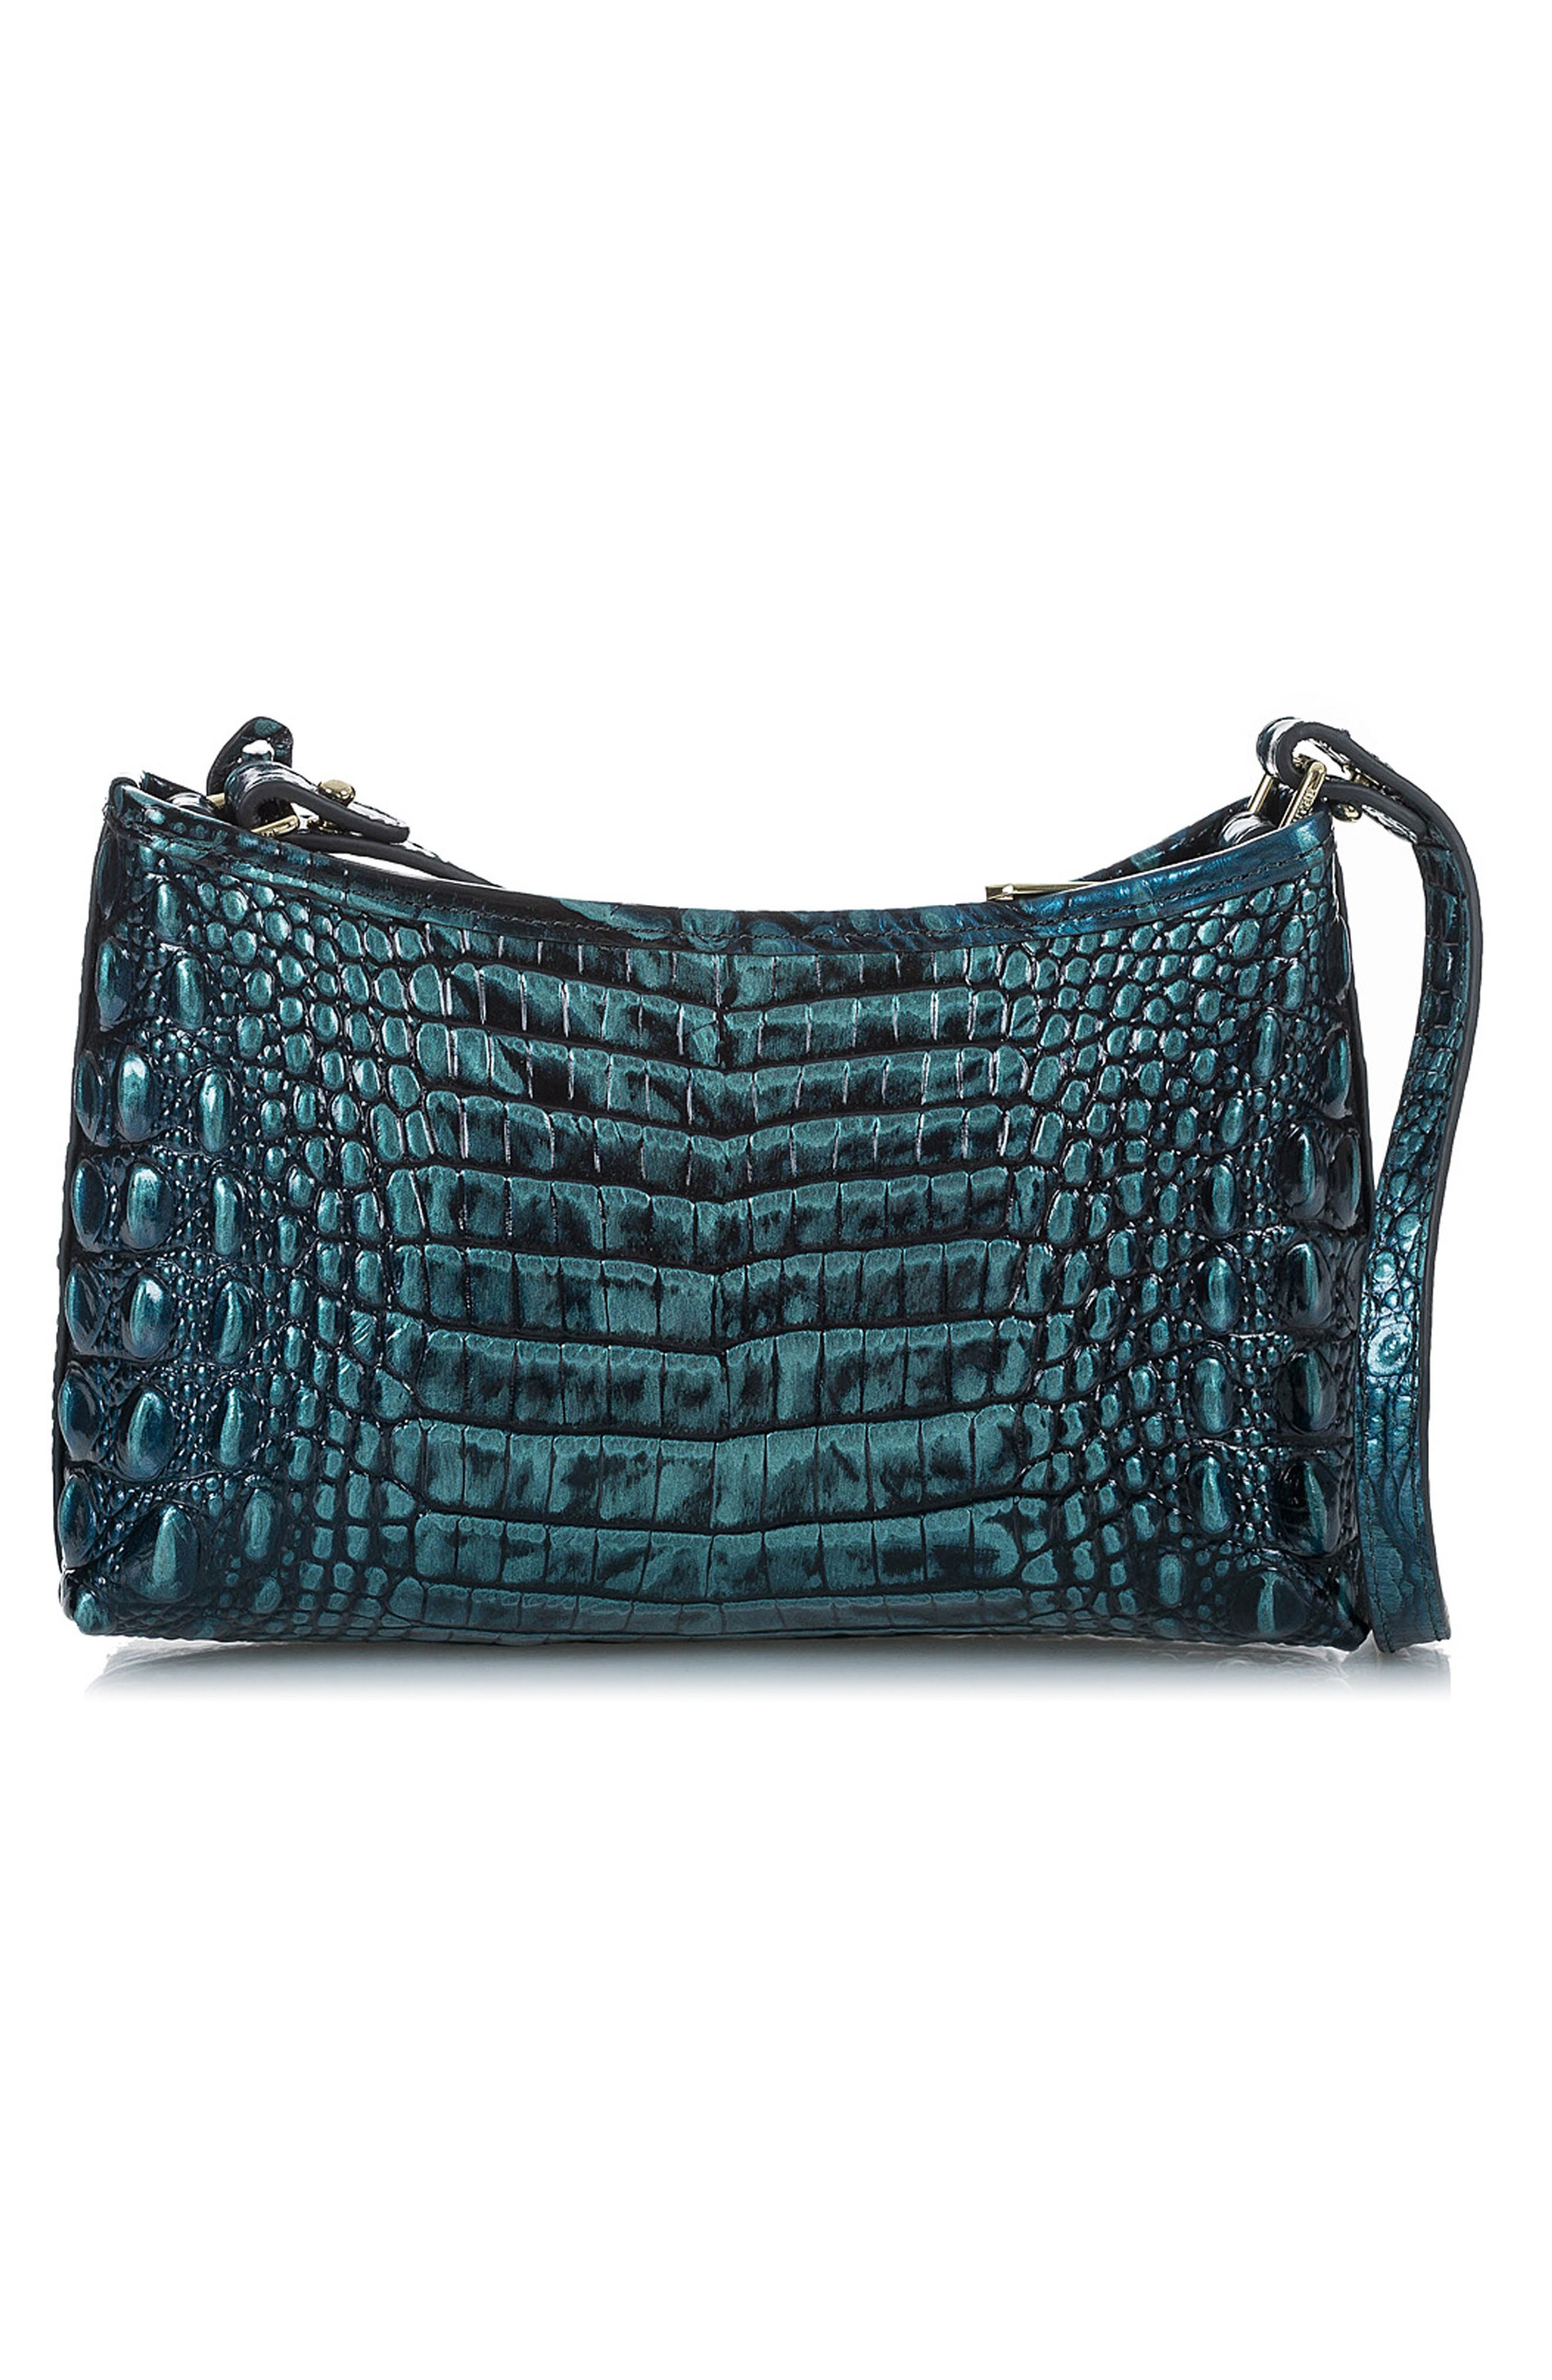 'Anytime - Mini' Convertible Handbag,                             Alternate thumbnail 29, color,